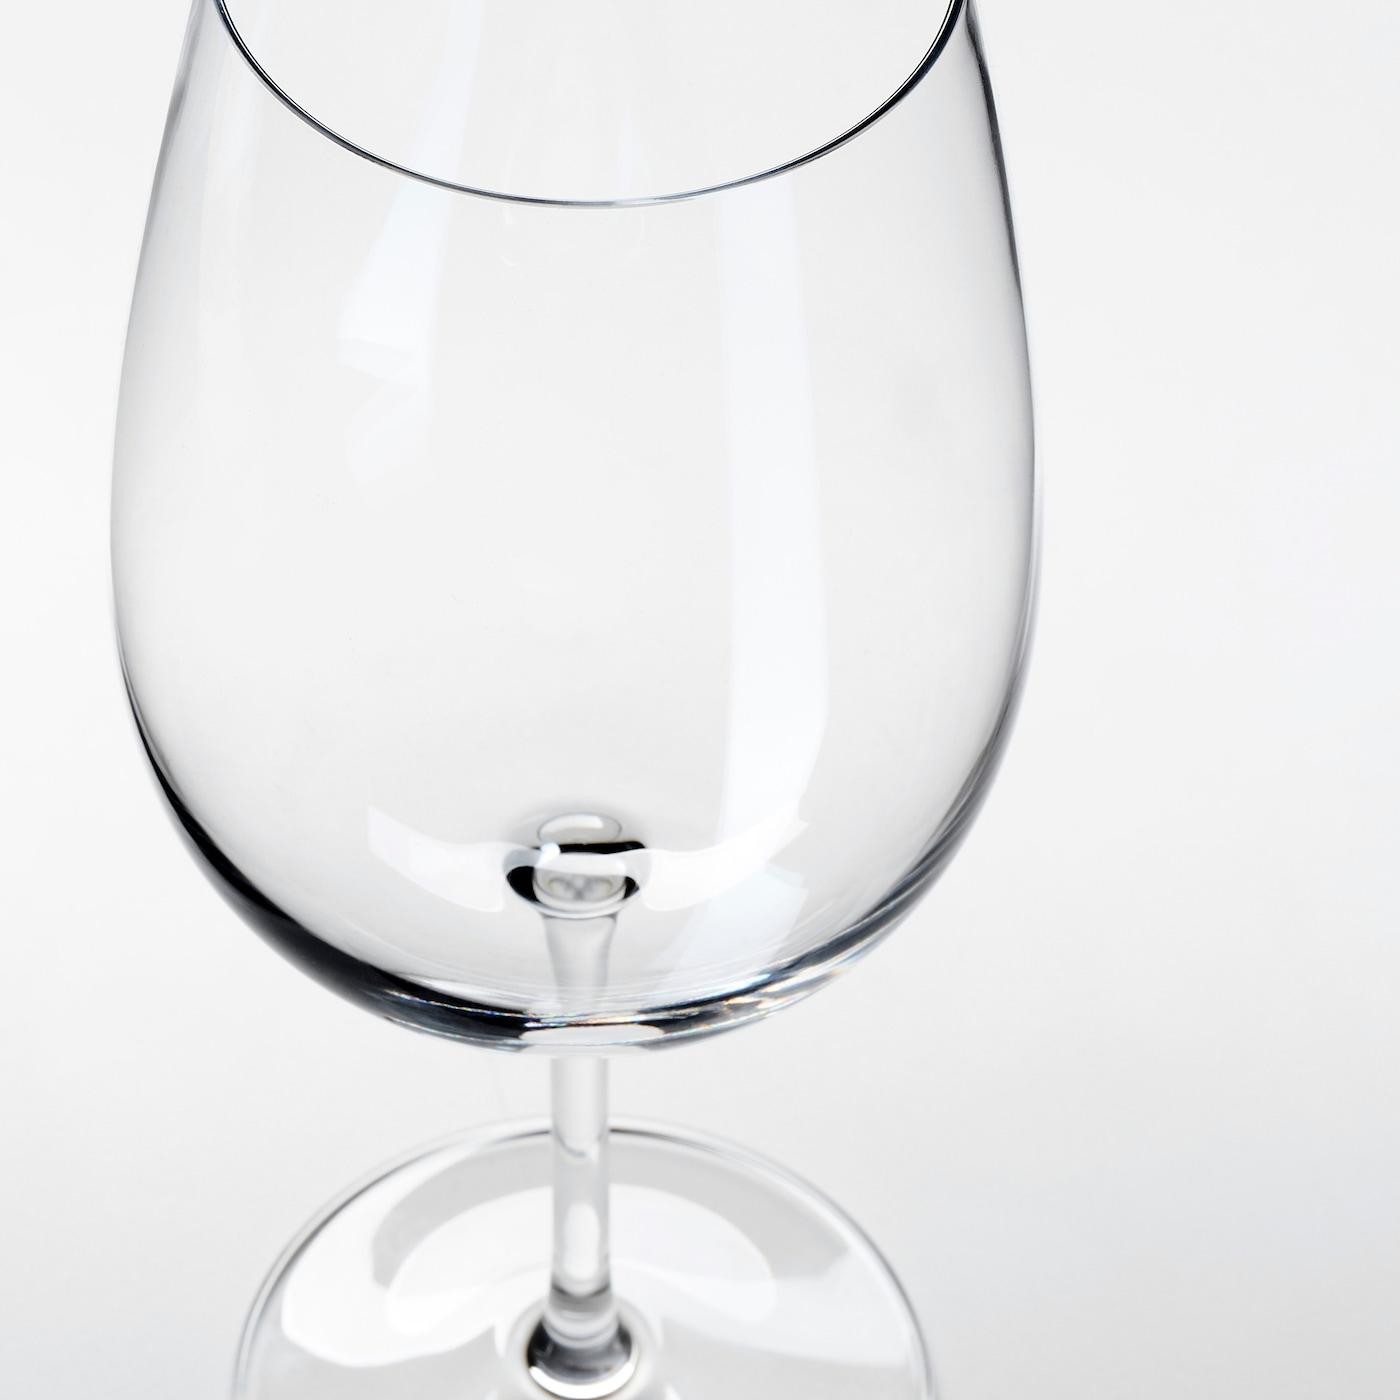 STORSINT Red wine glass, clear glass, 68 cl